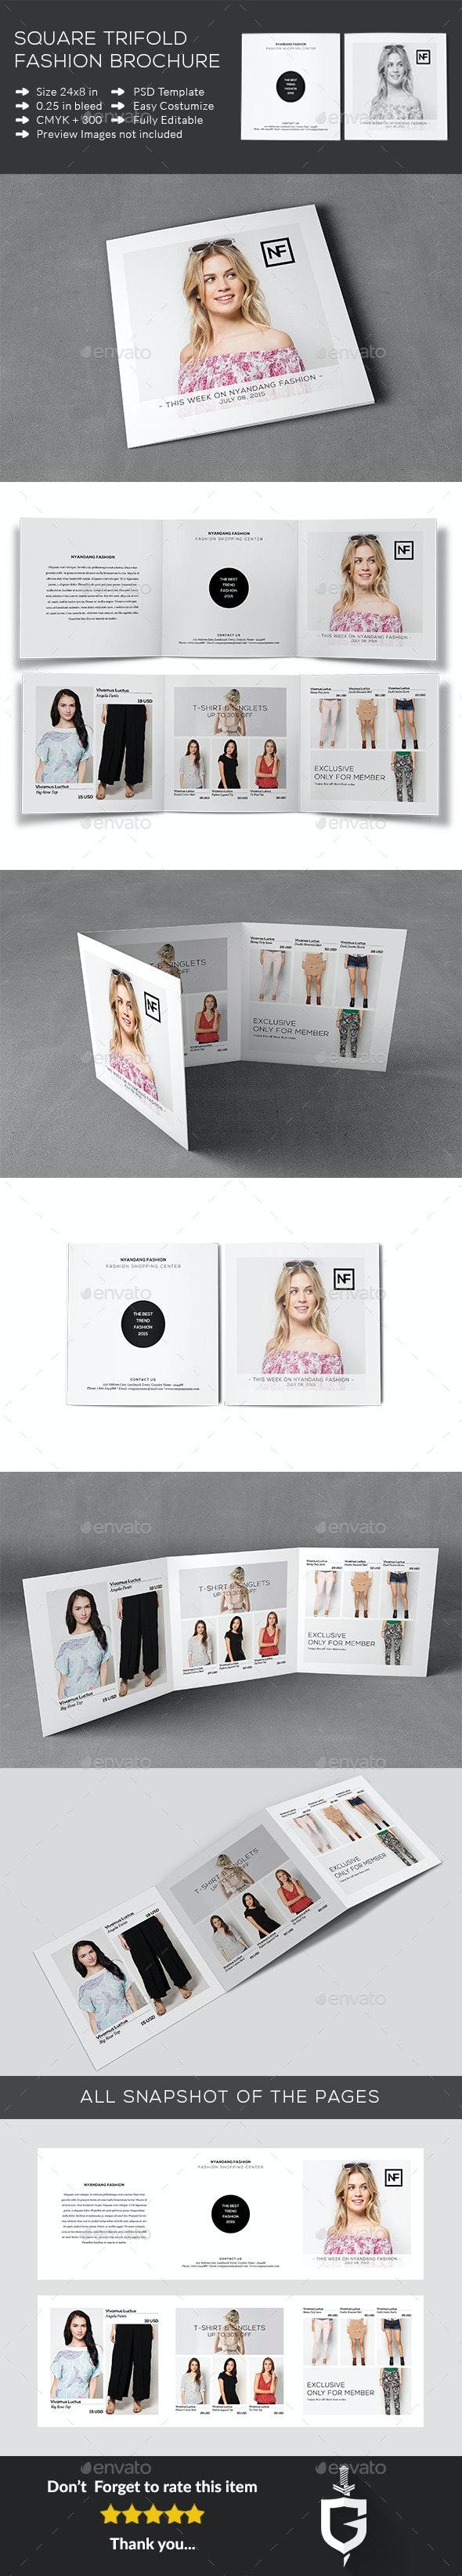 Square Trifold Fashion Brochure - Catalogs Brochures